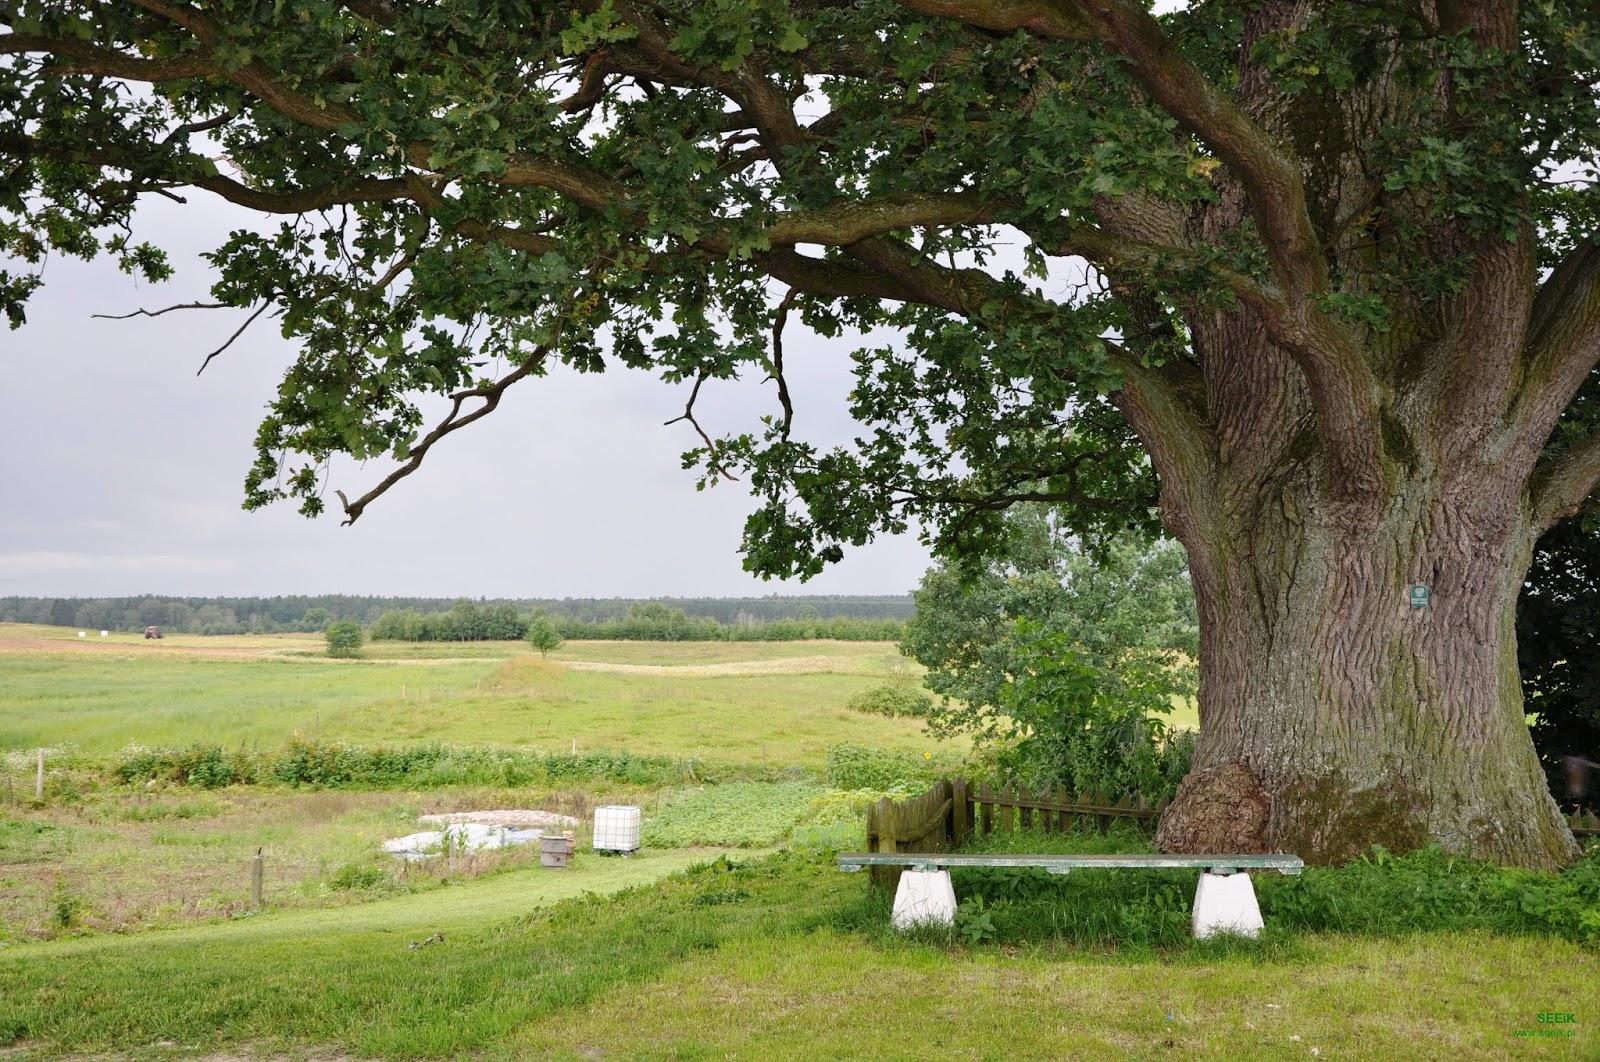 www.seeik.pl SEEiK Association nature monuments